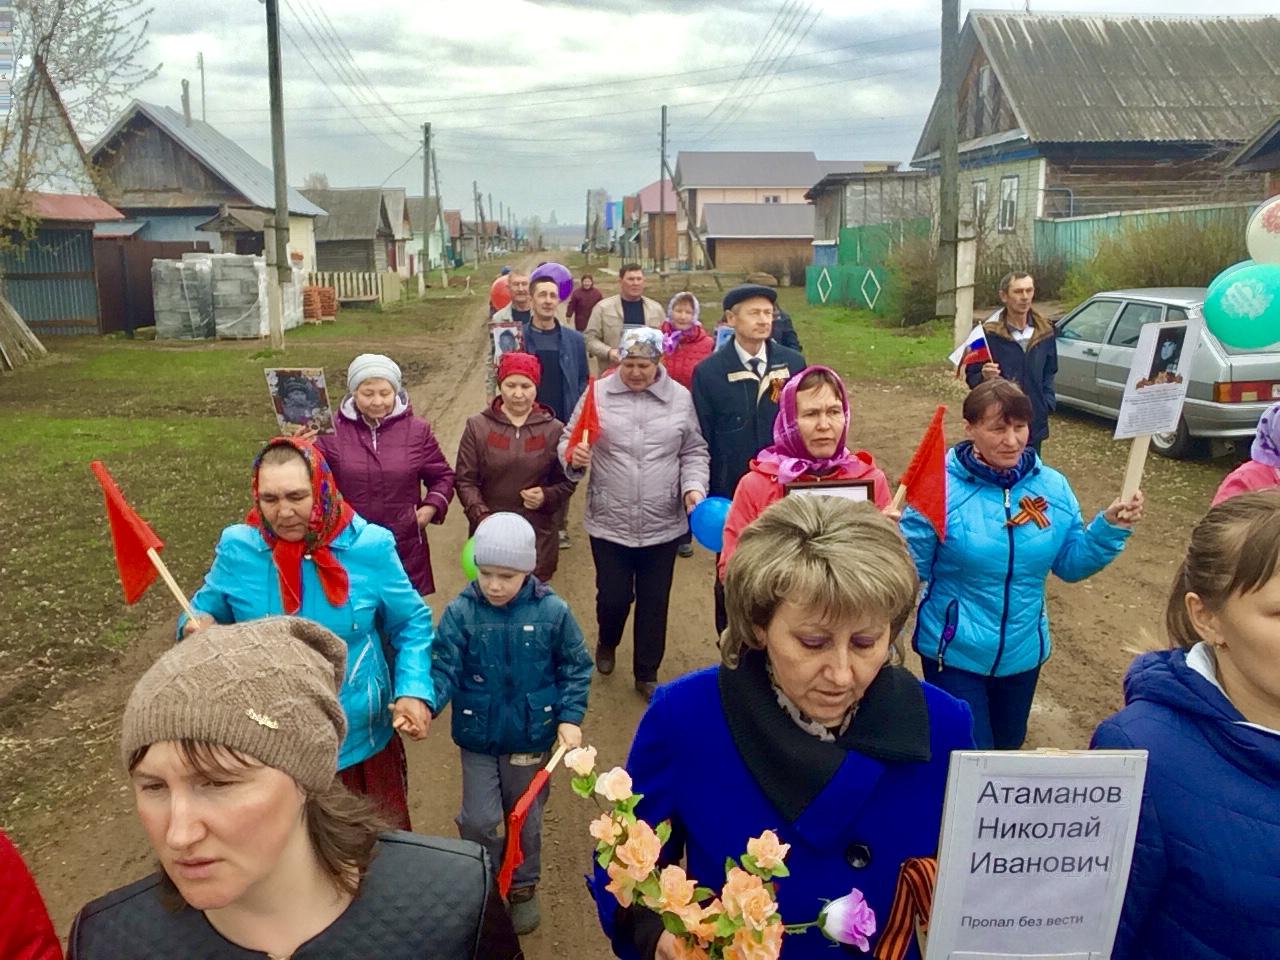 A Victory Day parade (бессмертный полк) in rural Udmurtia